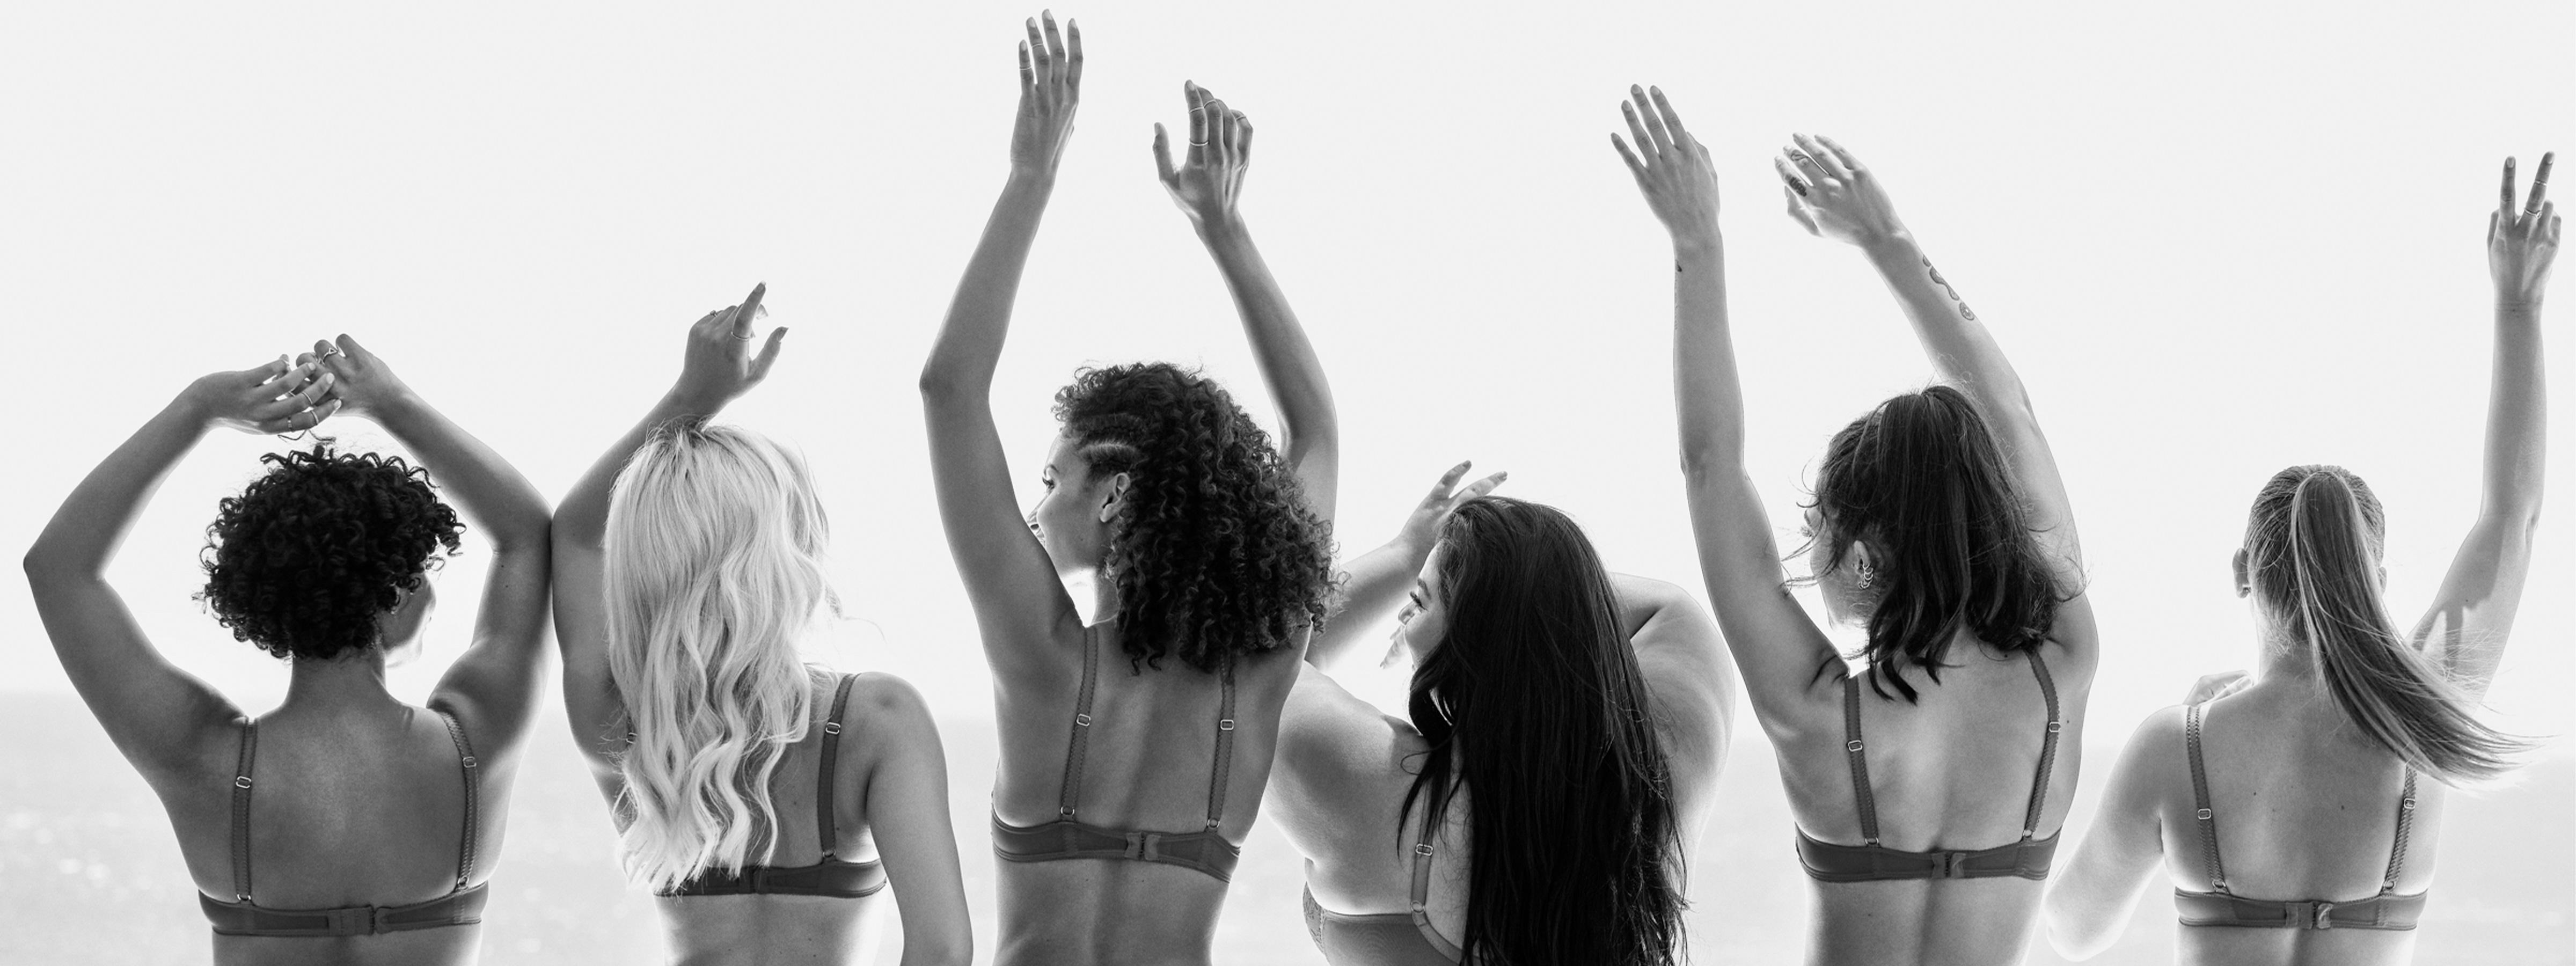 Women of all sizes celebrating their bodies.